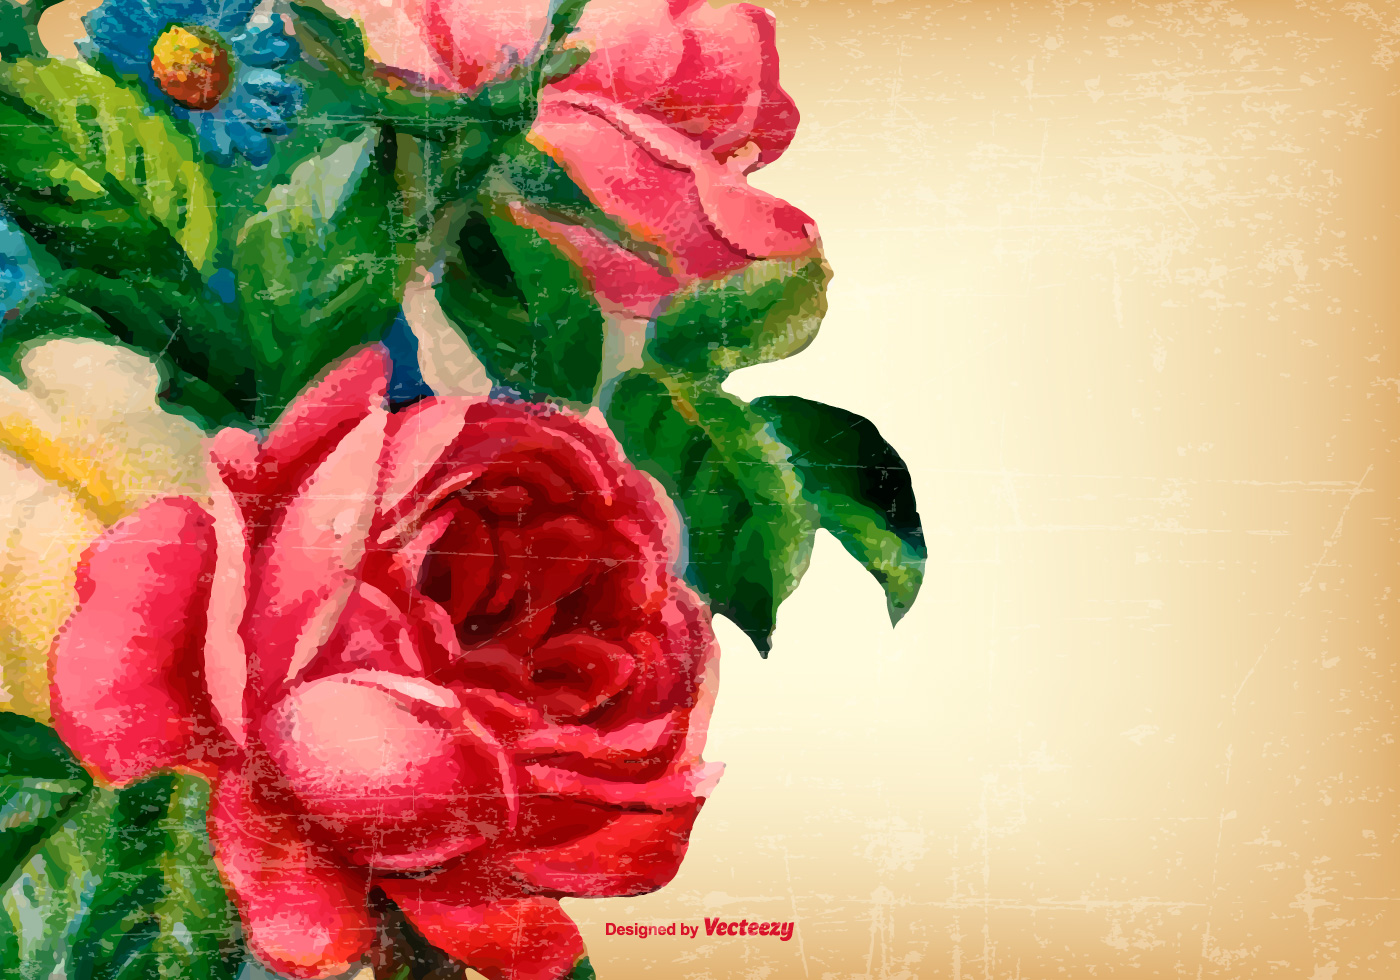 Vintage Grunge Flower Background Download Free Vector Art Stock Graphics Images